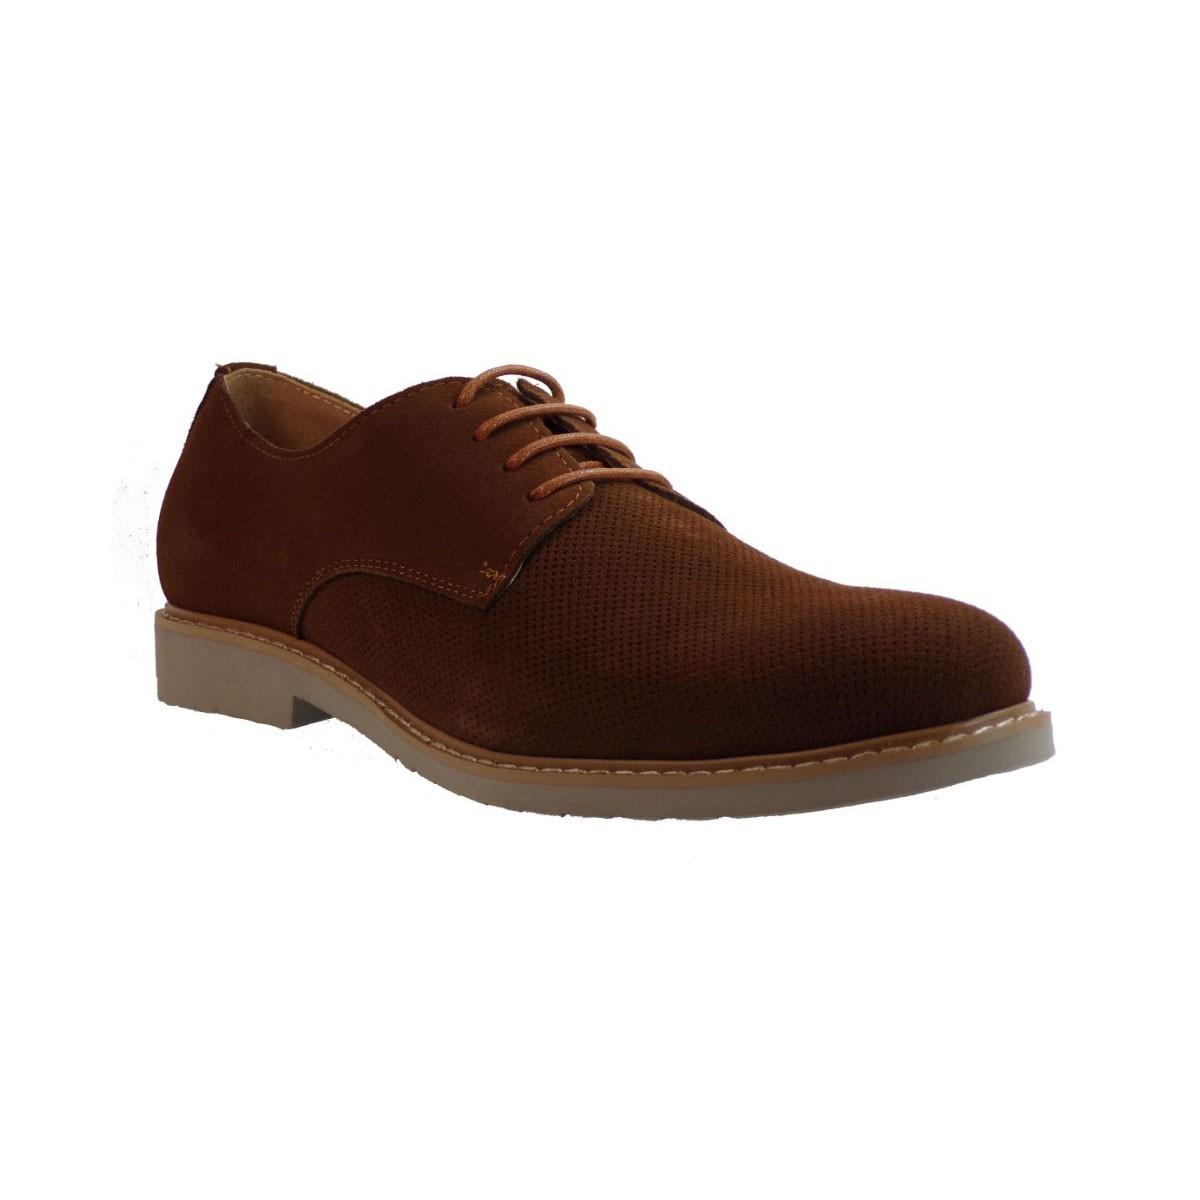 EGO Ανδρικά Παπούτσια G67-05043 Ταμπά